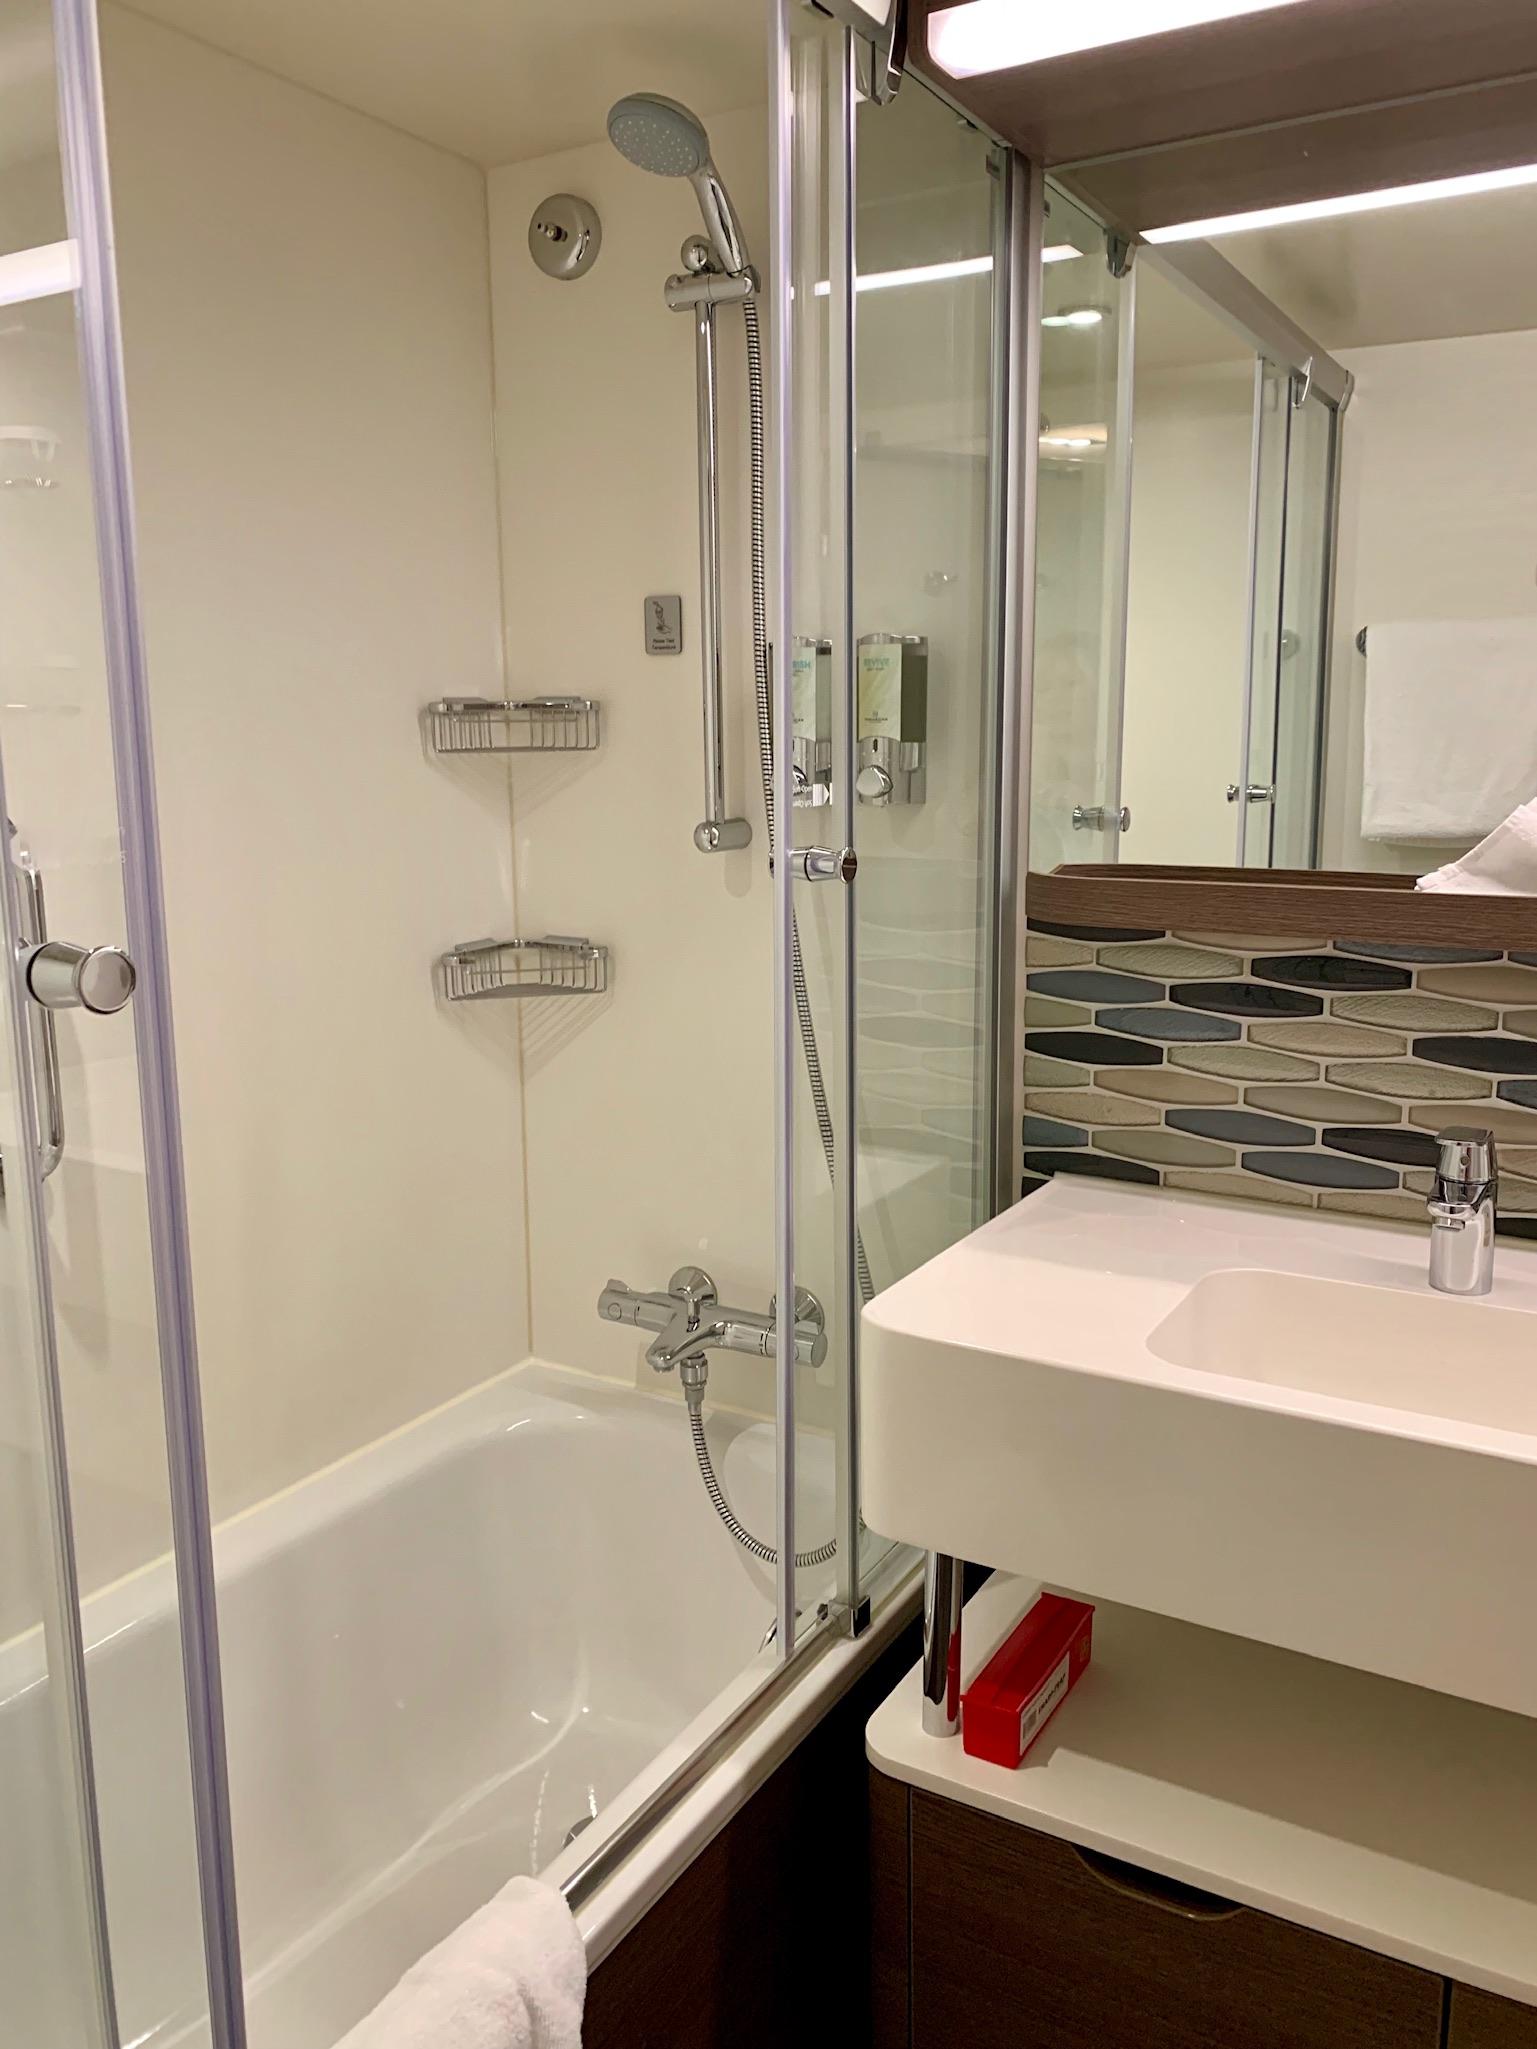 NCL Joy Room Concierge Family Inside Master Bedroom Bathtub.jpg